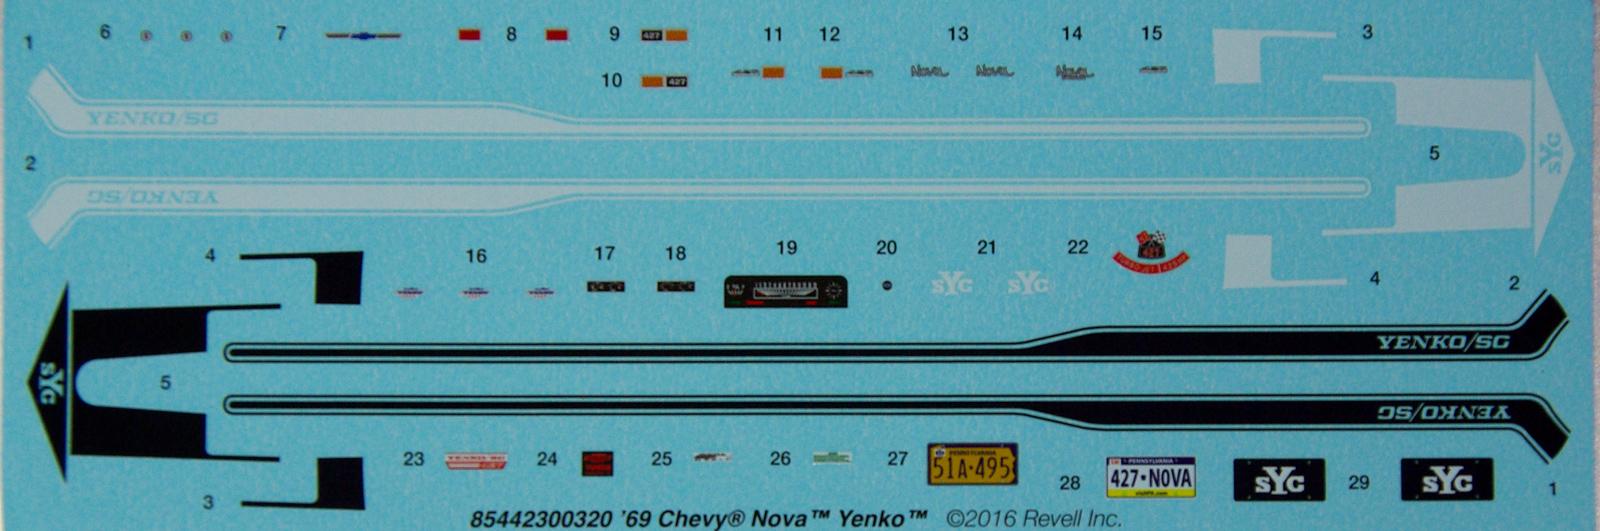 Review Chevy Nova Yenko Ipms Usa Reviews